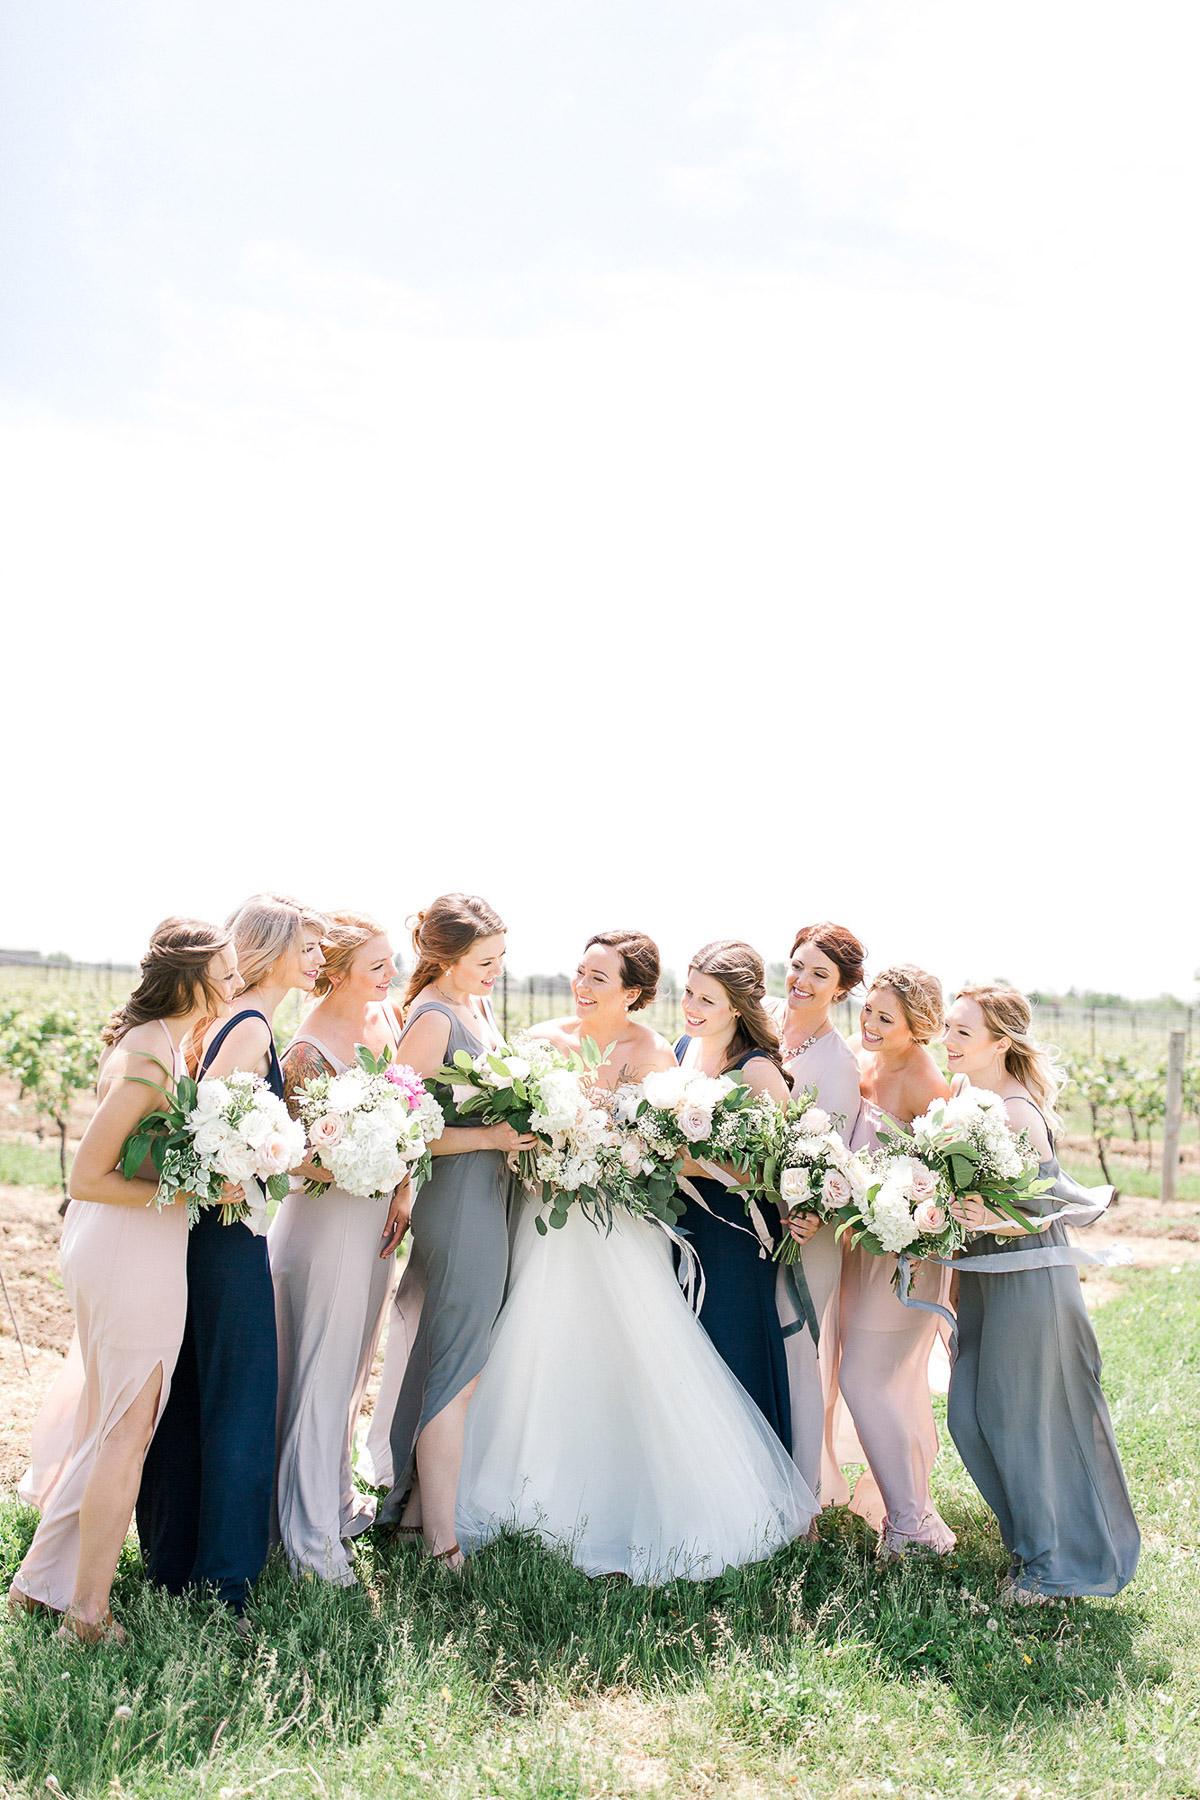 beatrice-elford-photography-vineyard-bride-swish-list-balls-falls-vineland-wedding-29.jpg